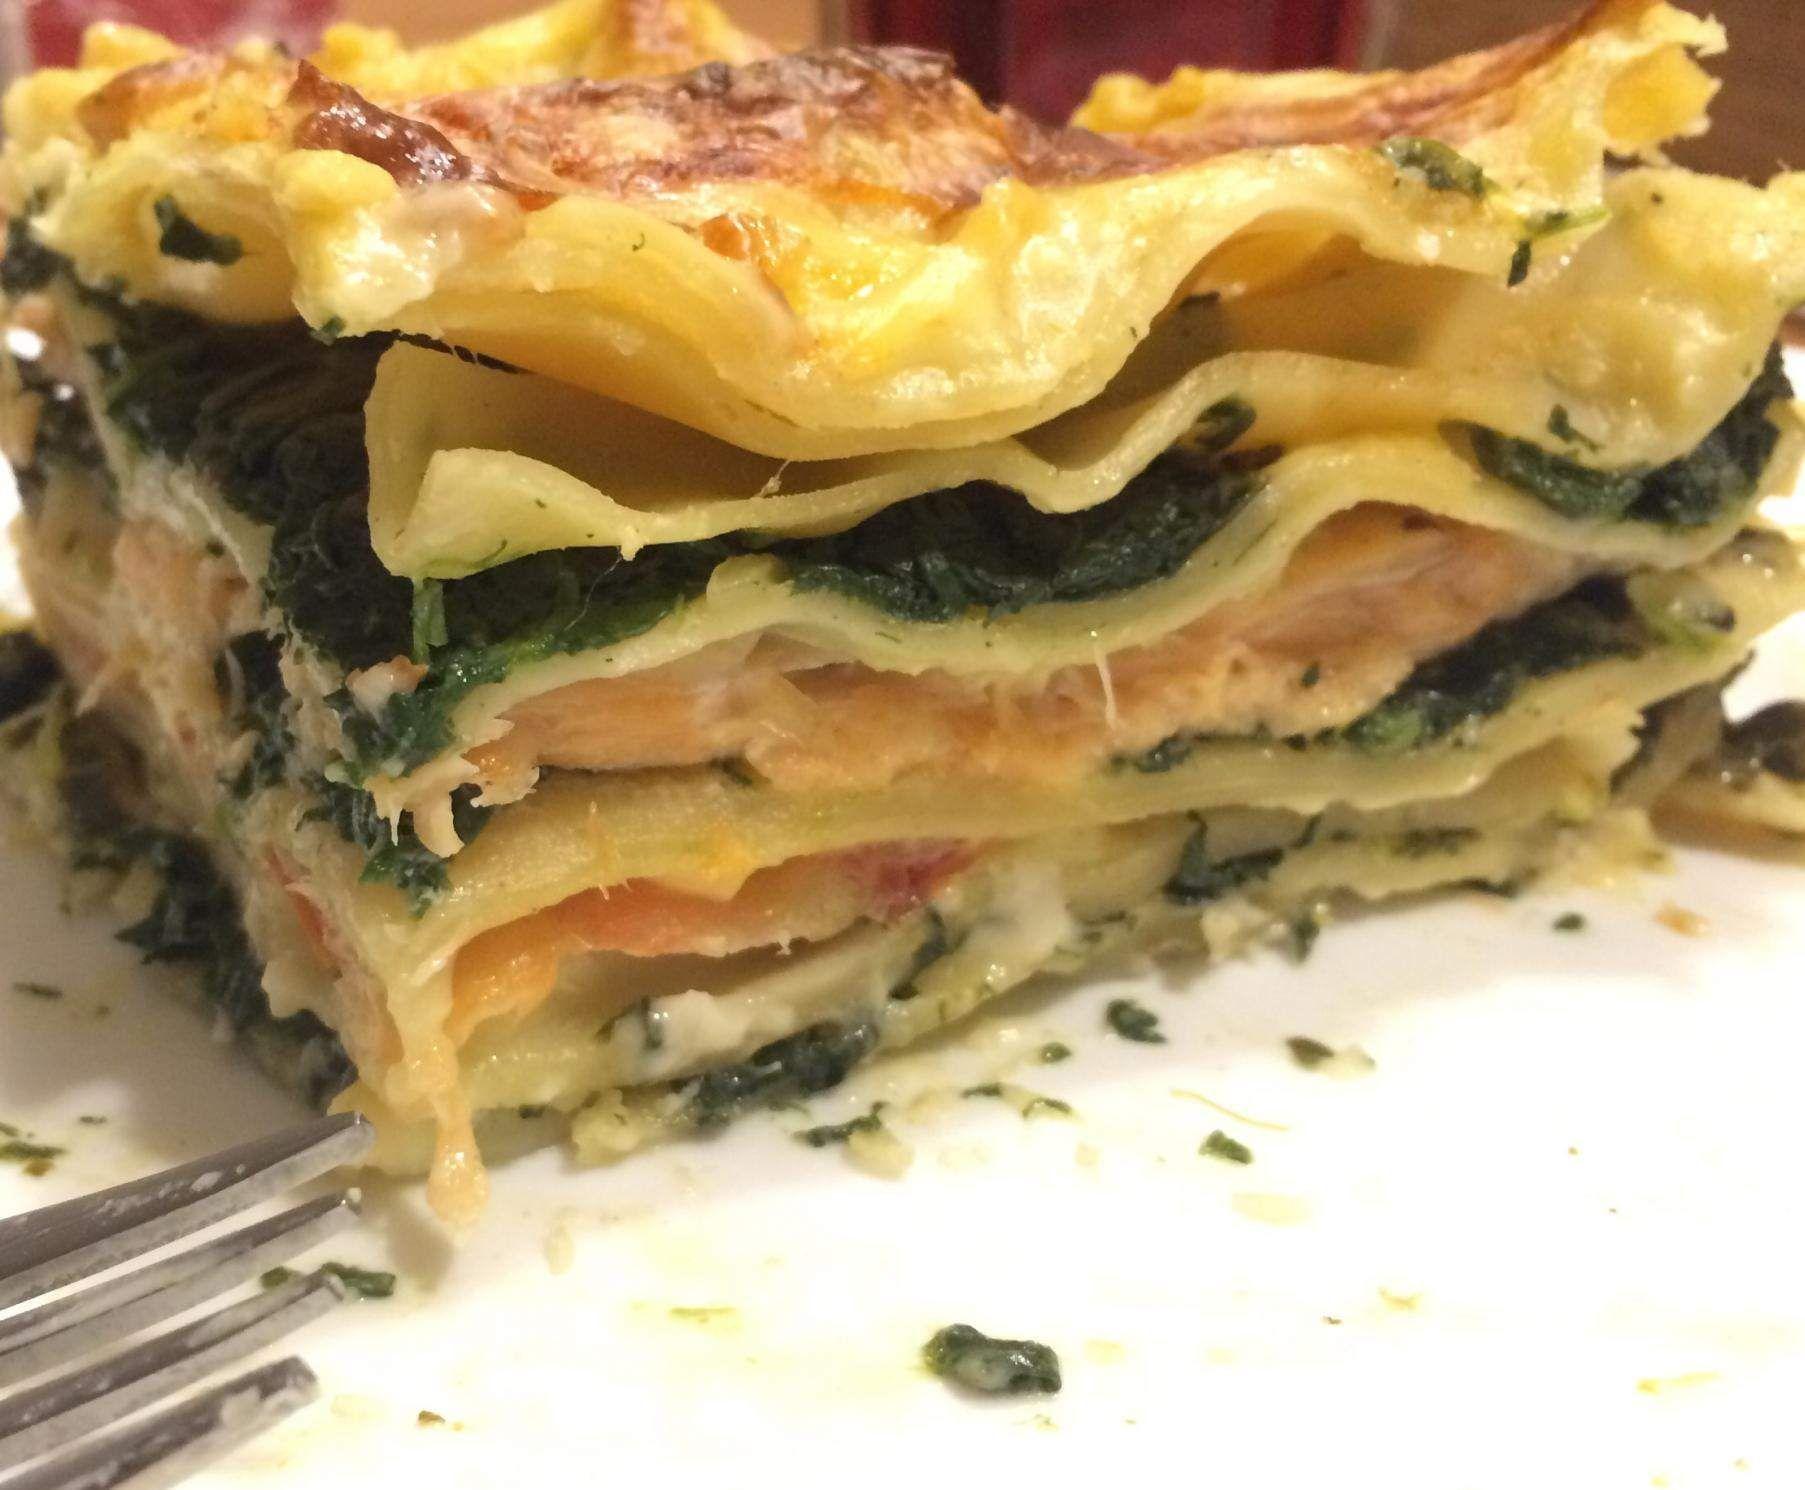 spinat lachs lasagne mit r ucherlachs rezept lachs lasagne r ucherlachs und lasagne. Black Bedroom Furniture Sets. Home Design Ideas